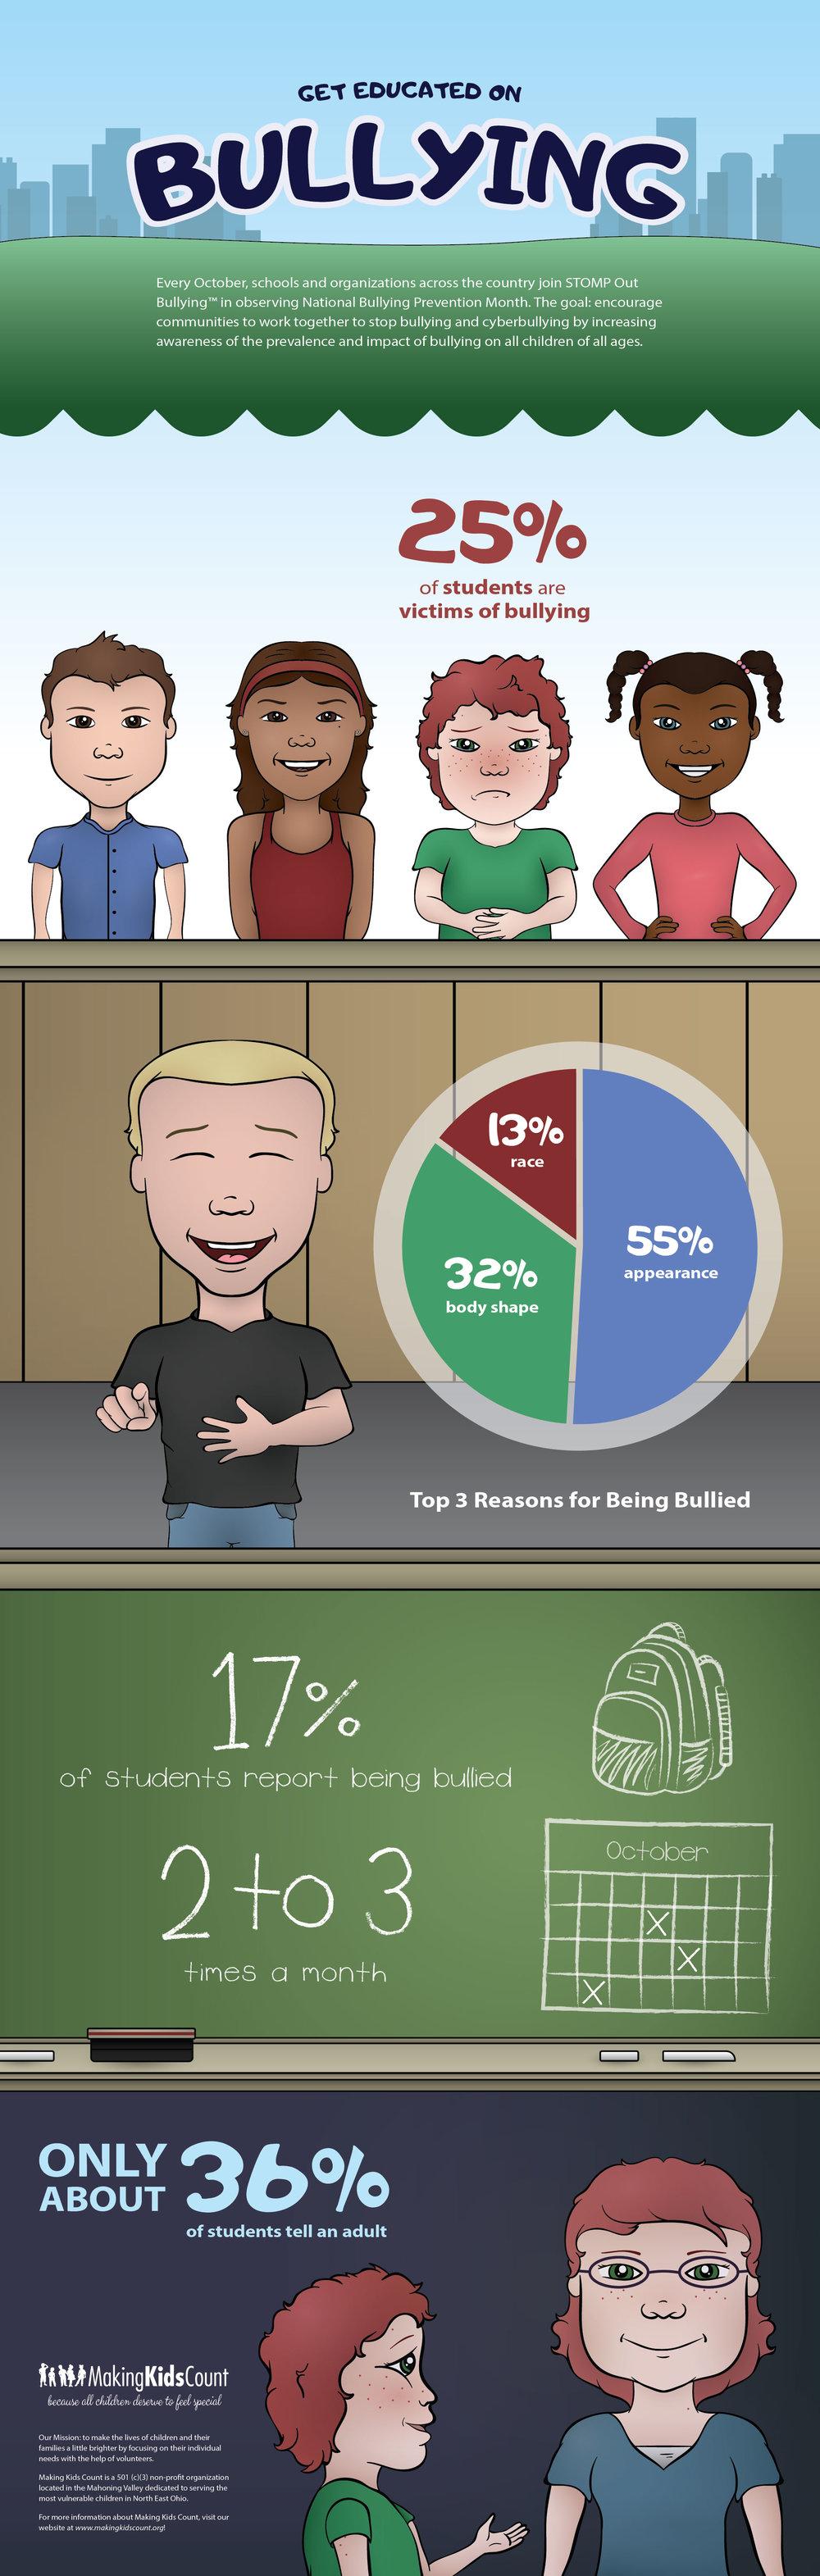 bullying infographic-01.jpg